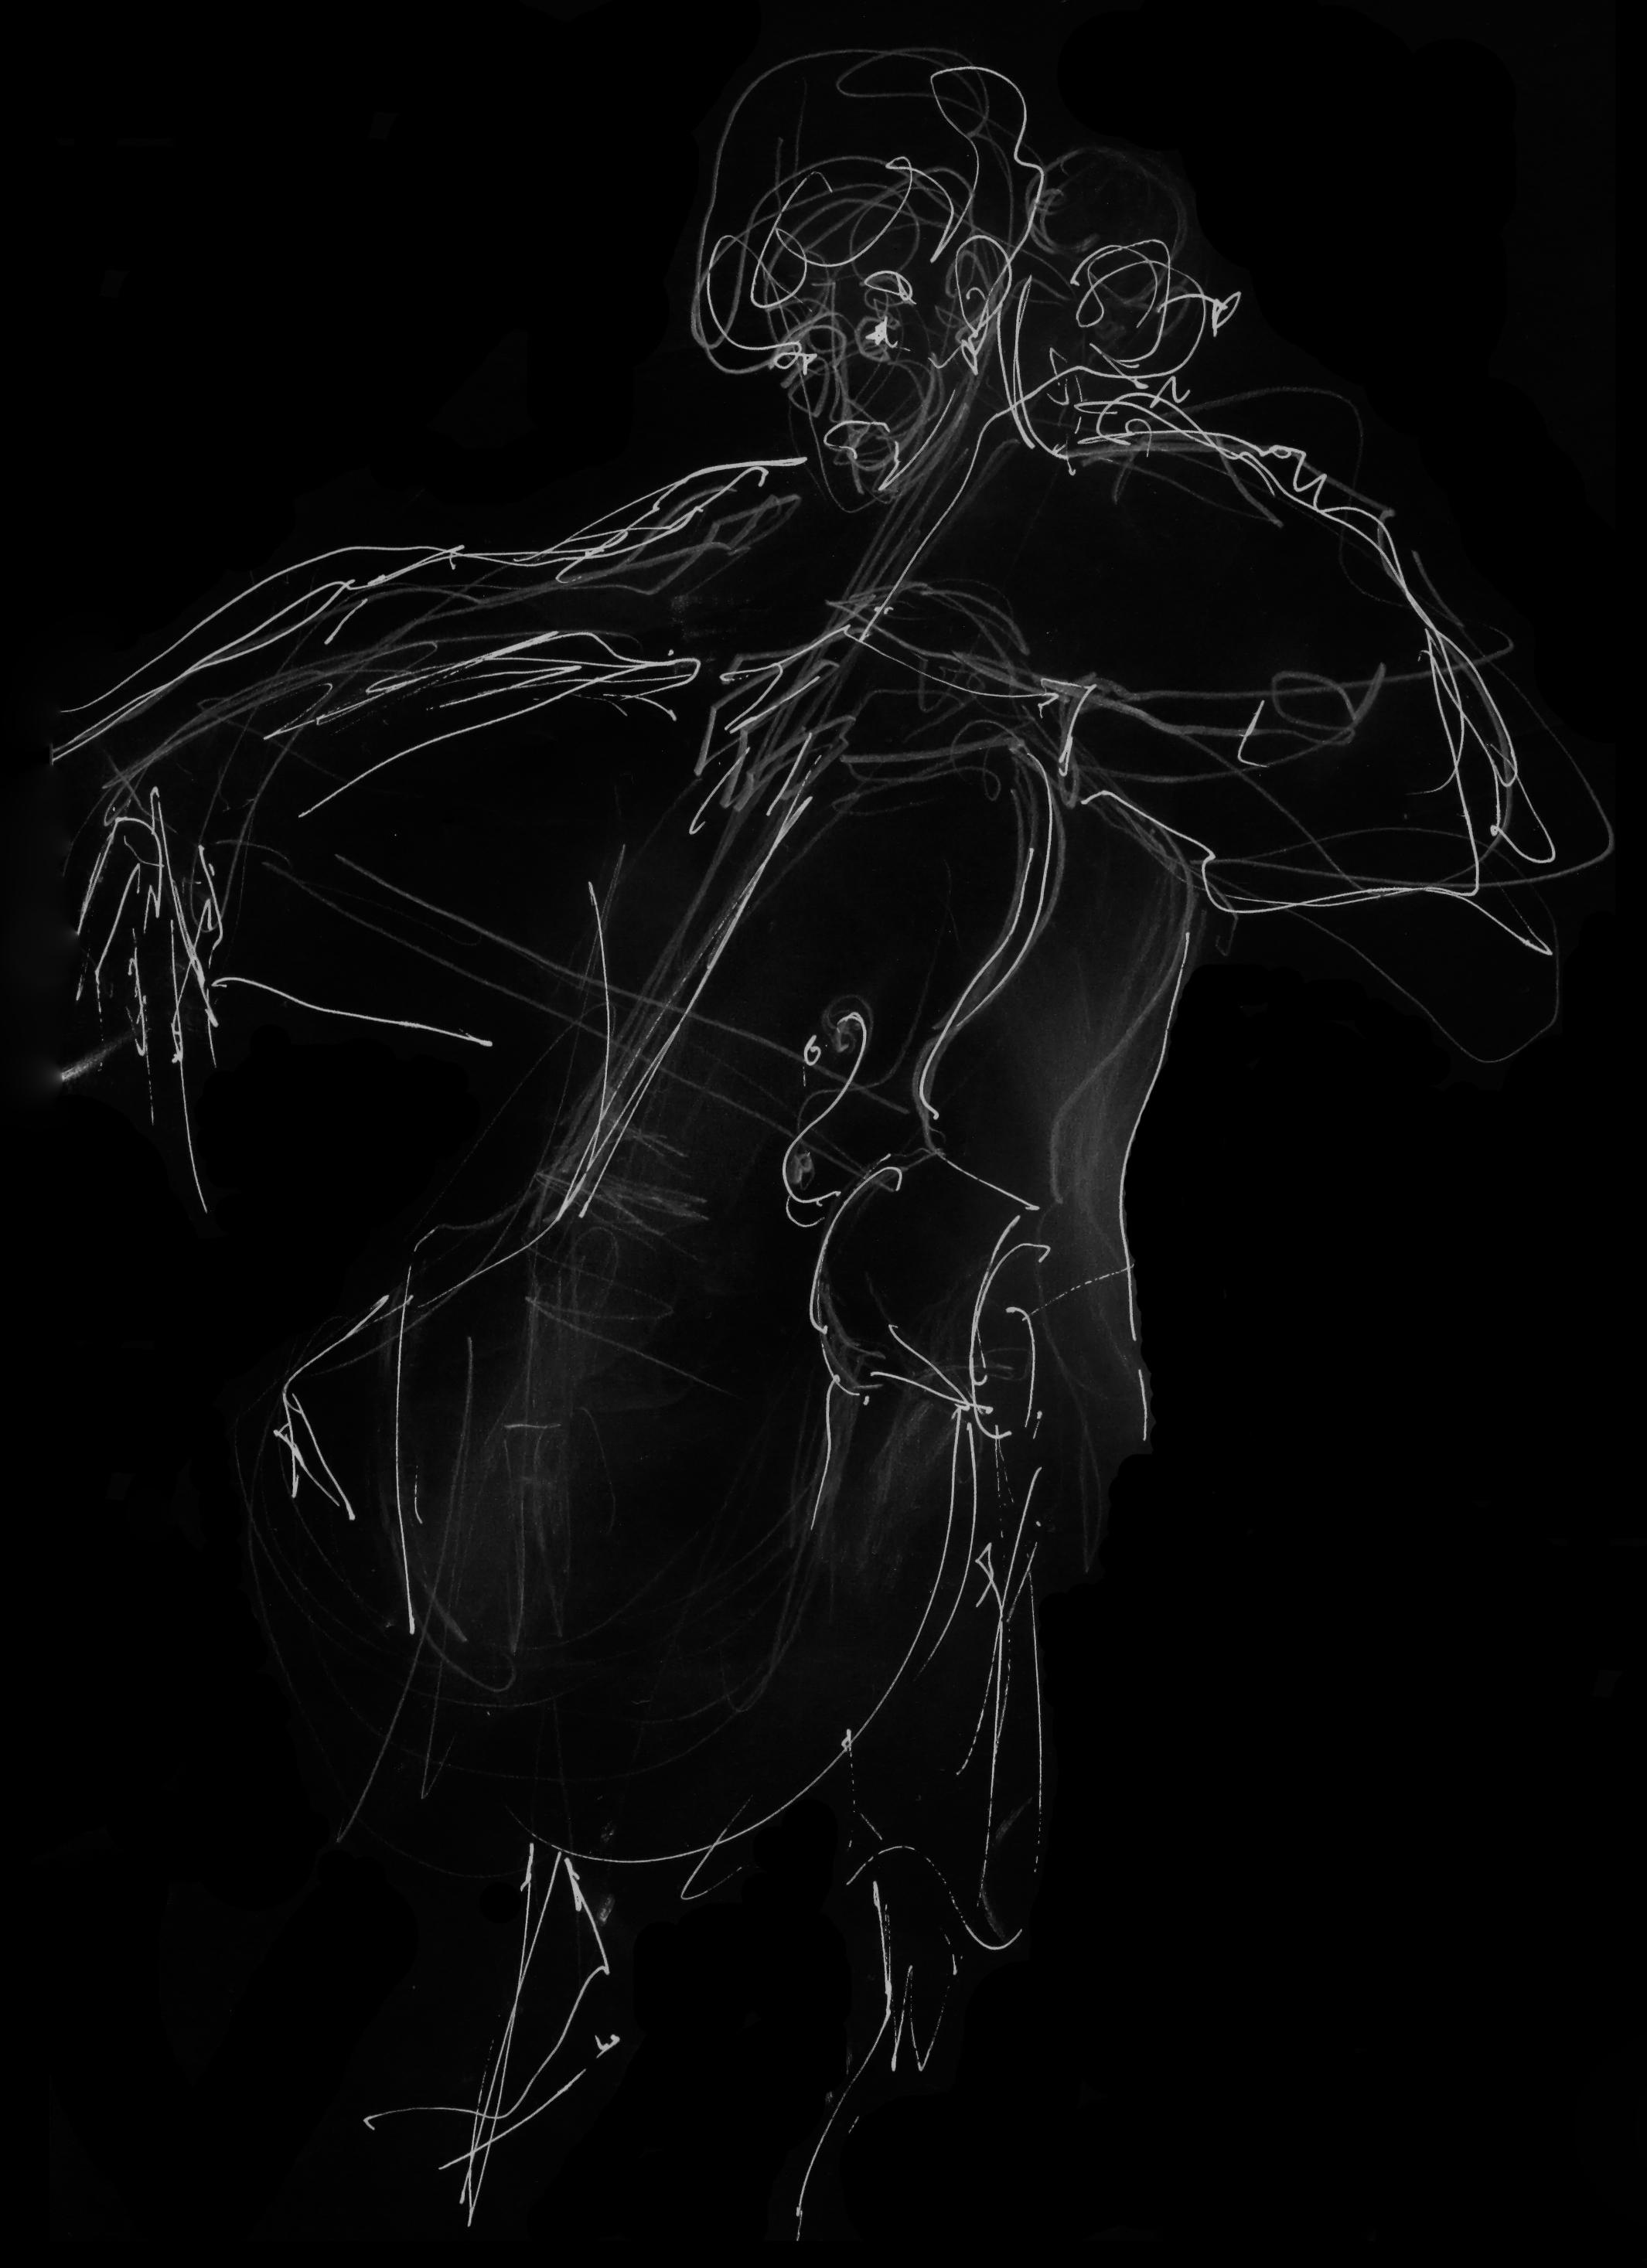 Dibujo por Liduine Zumpolle.